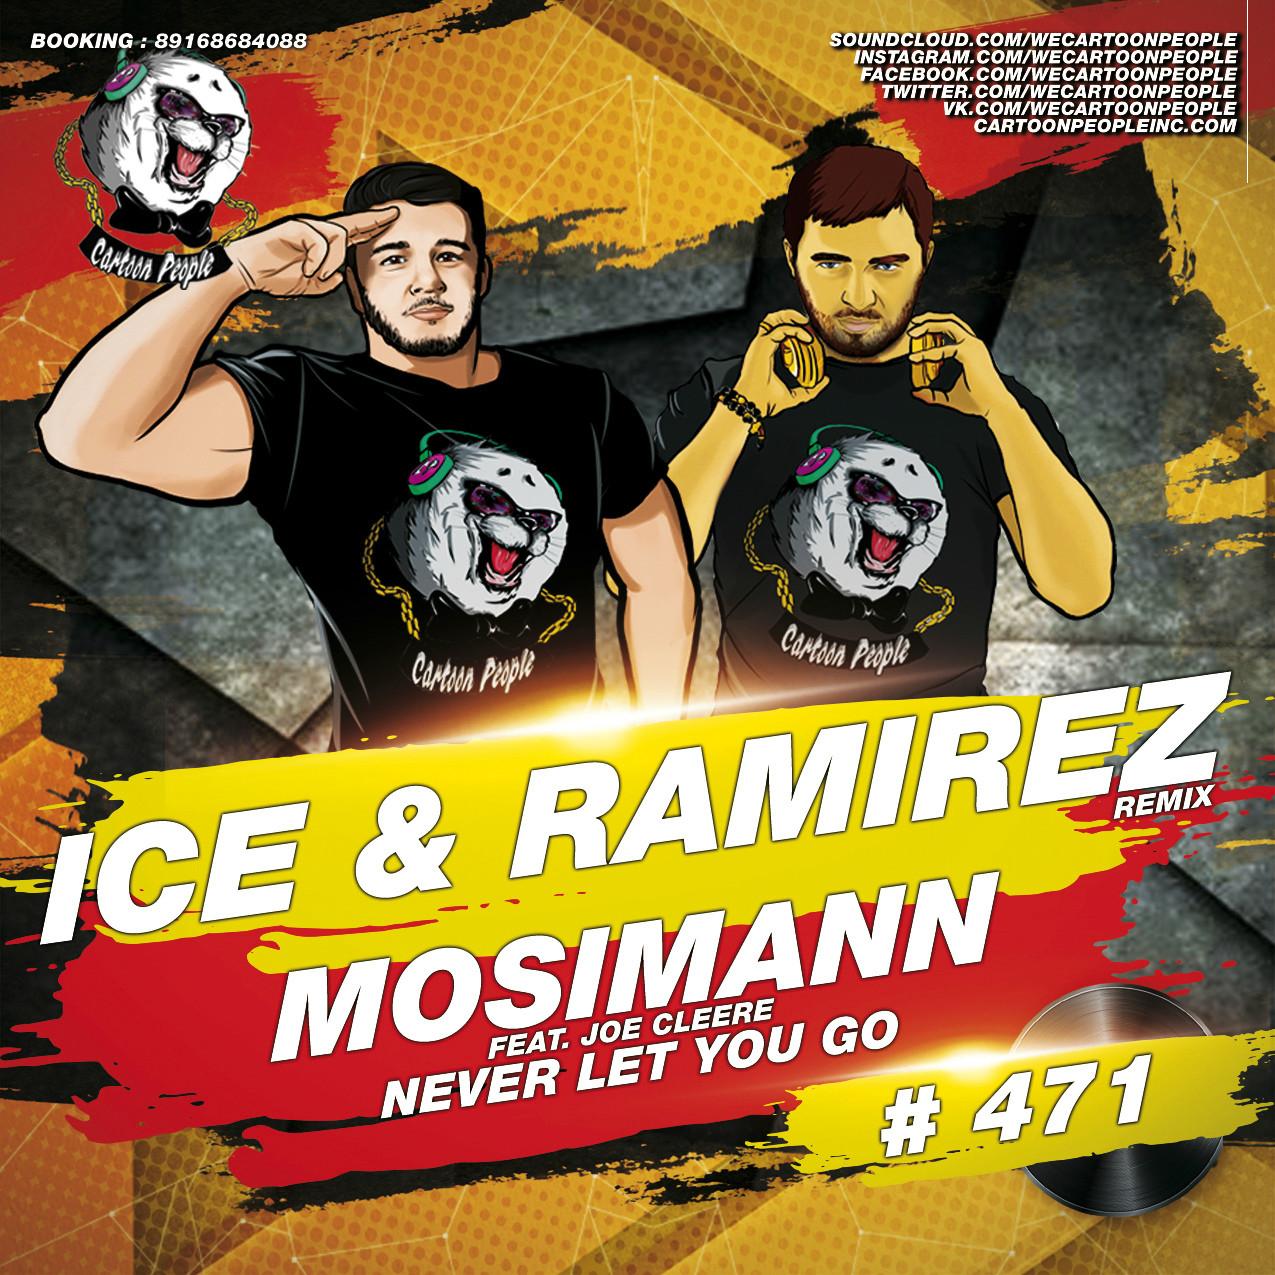 Mosimann - Never Let You Go (Feat. Joe Cleere)(Ice I Ramirez Remix)